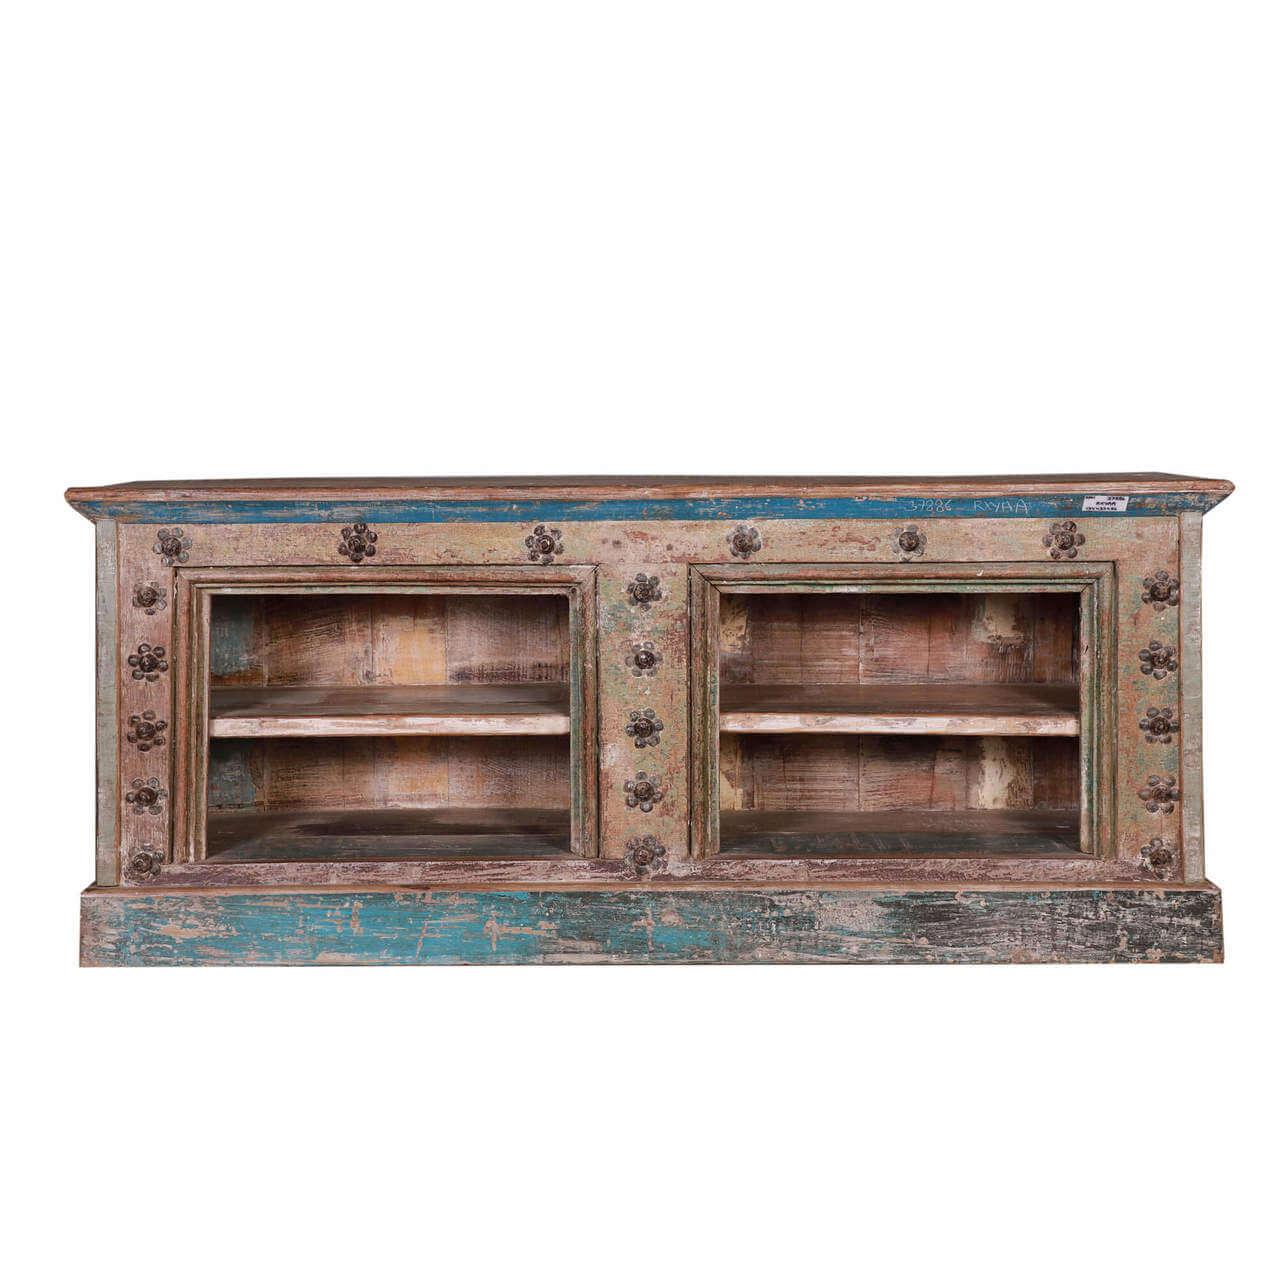 Lakeridge Reclaimed Wood Furniture Open Shelved TV Media Console